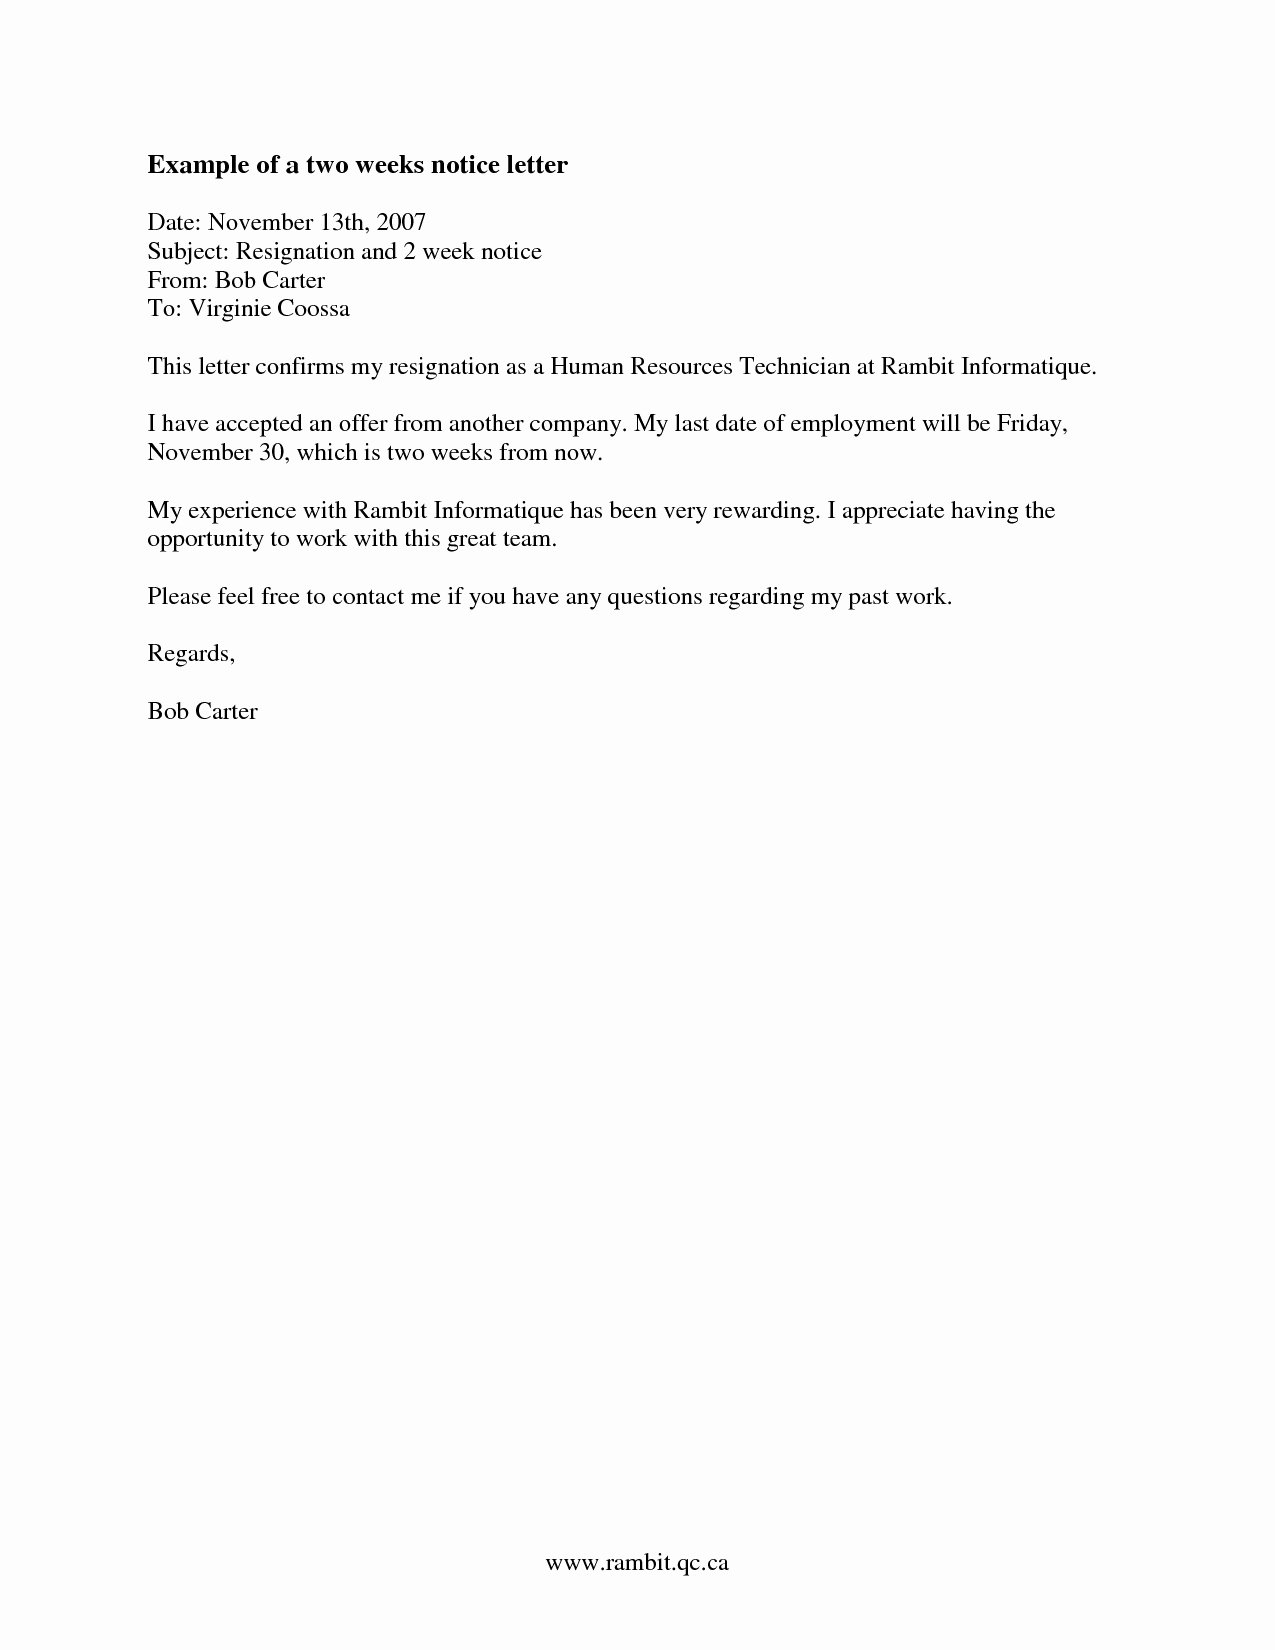 Sorority Recommendation Letter Template Fresh sorority Re Mendation Letter Template Collection